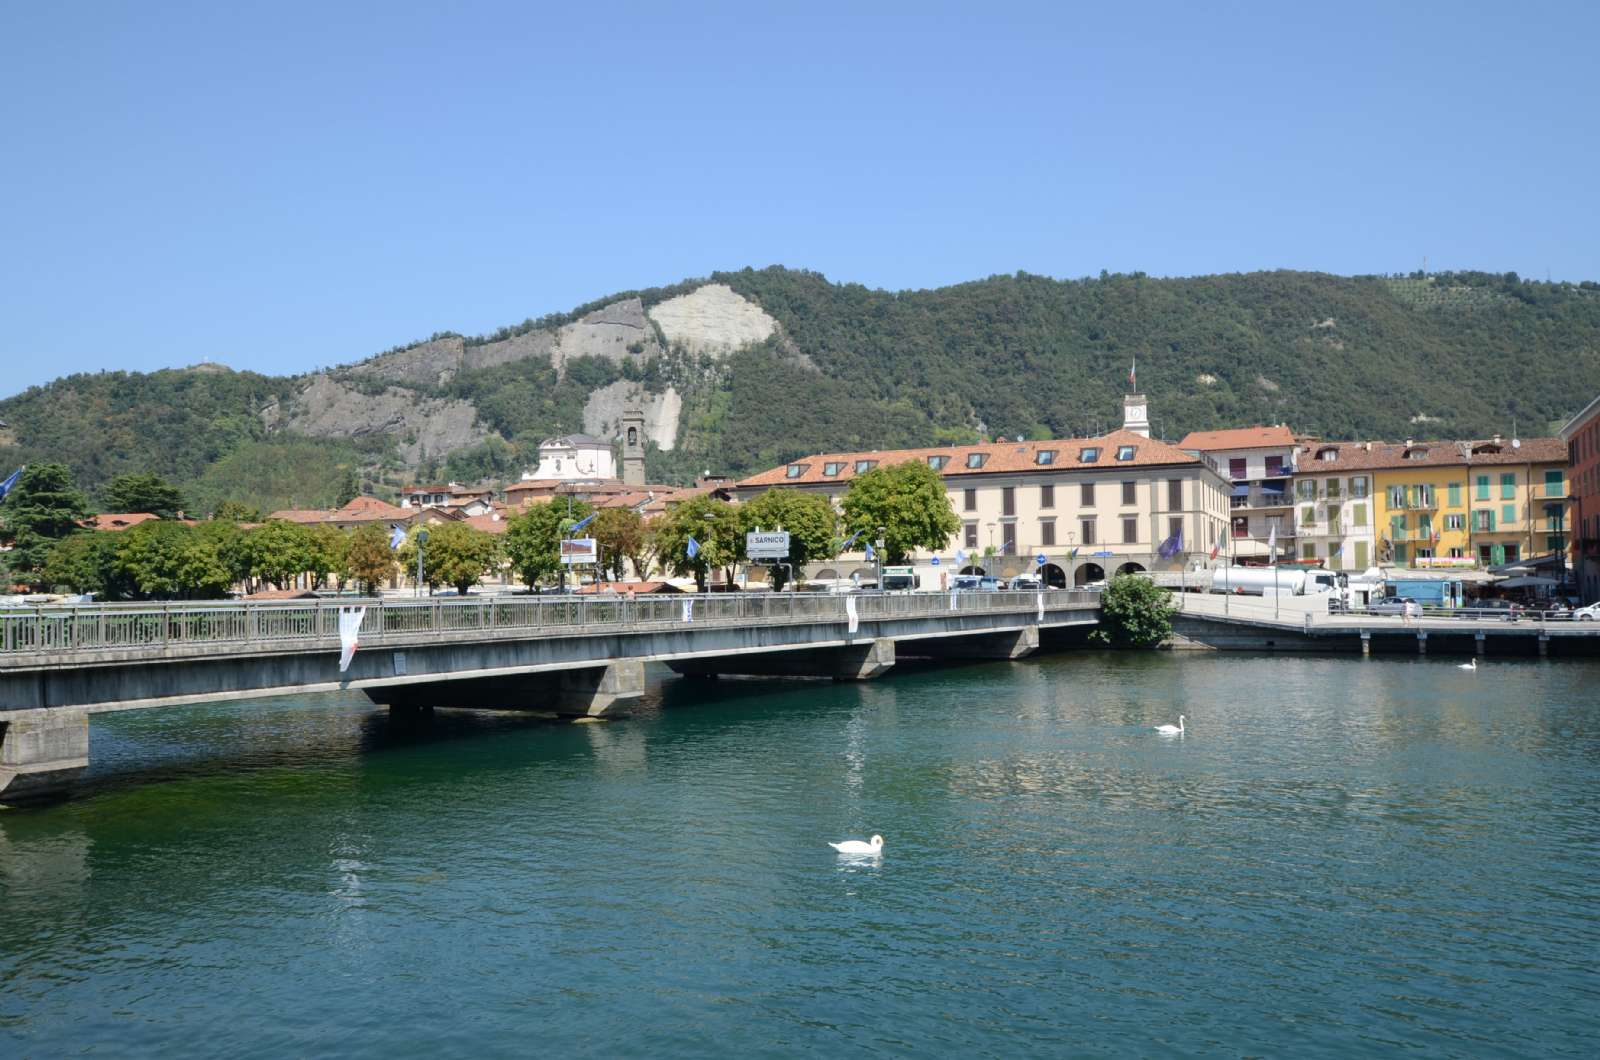 Le pont qui relie Paratico et Sarnico